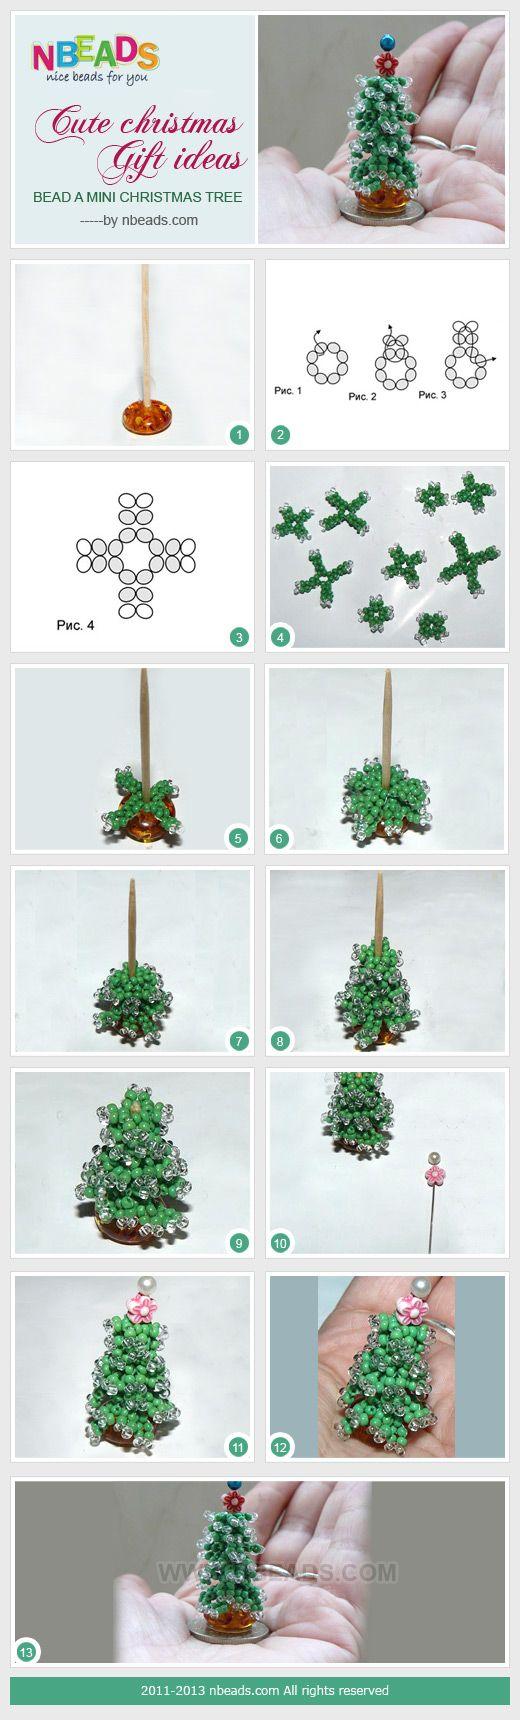 cute christmas gift ideas - bead a mini christmas tree